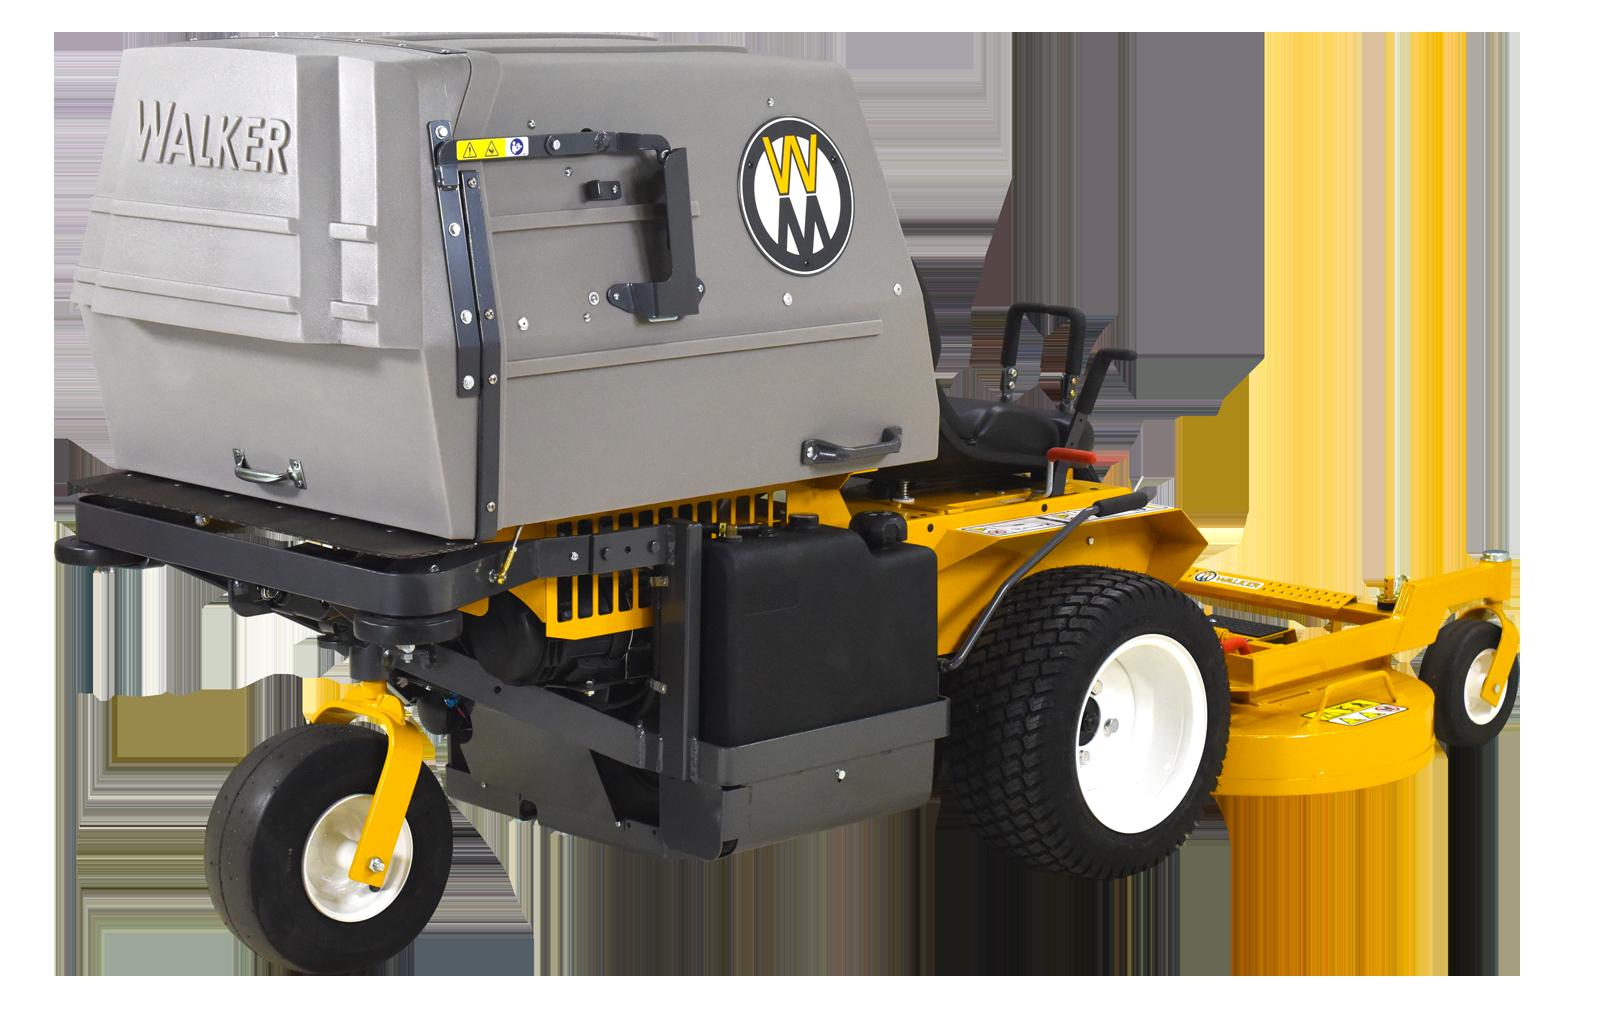 The Walker Model C19i Commercial Lawn Mower